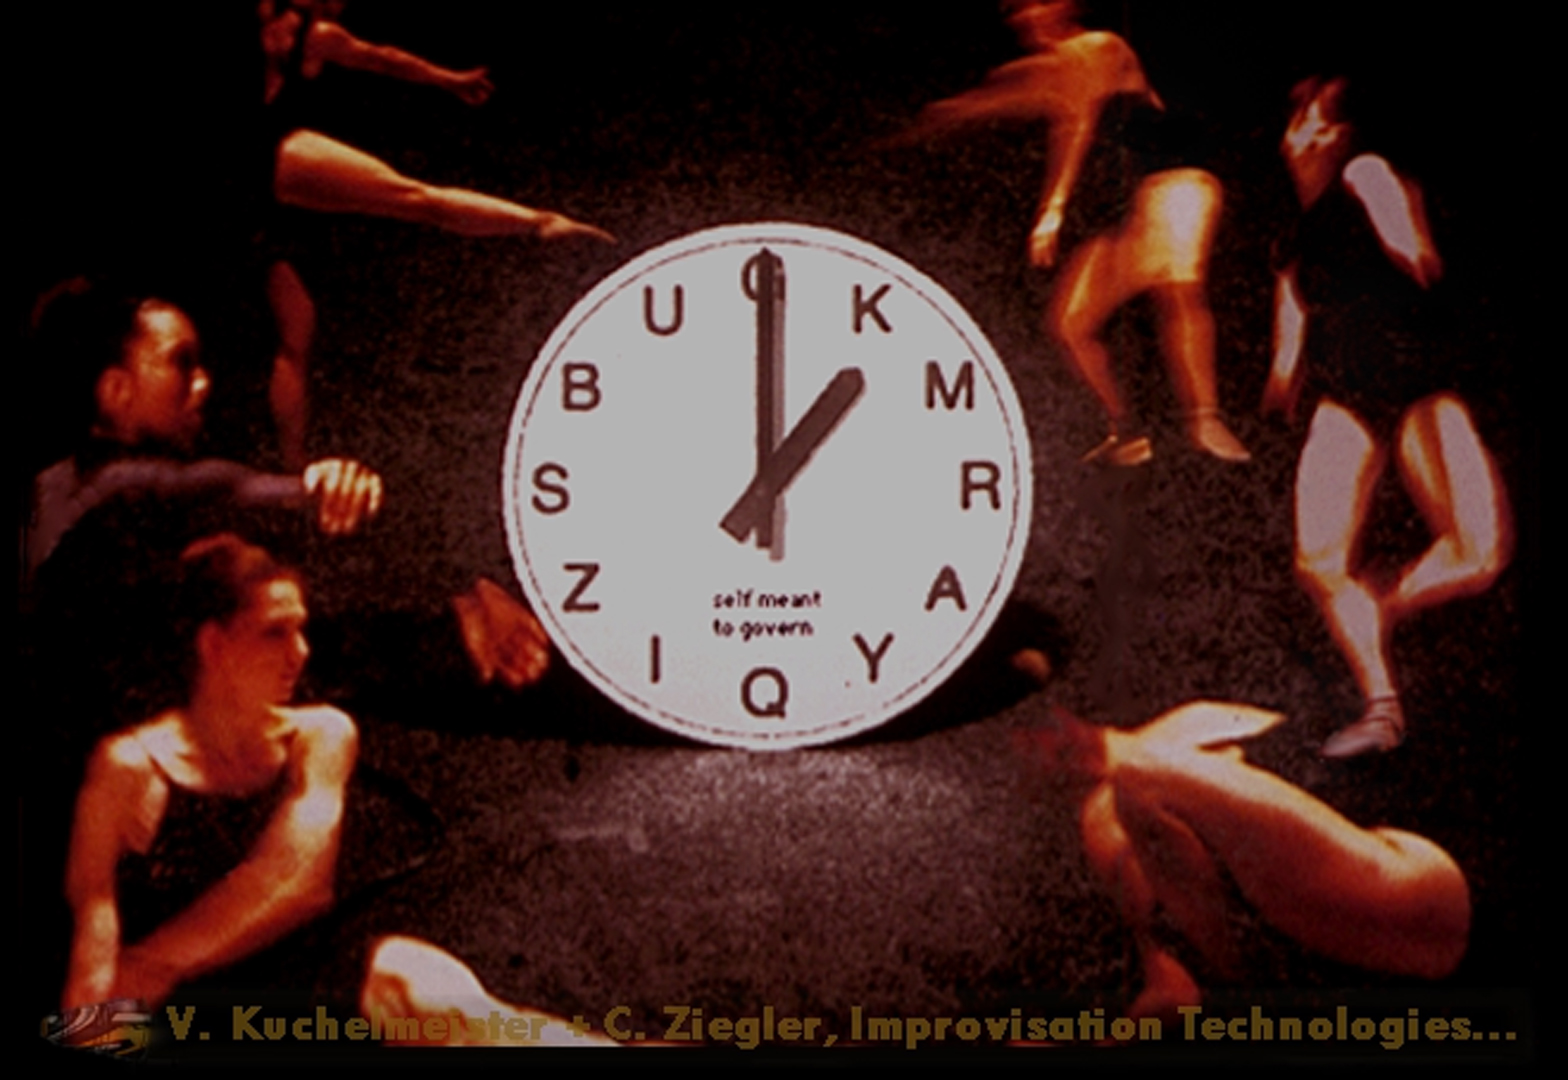 "©, Volker Kuchelmeister and Christian Ziegler, Improvisation Technologies: Bill Forsythe: ""Self Meant to Govern"""